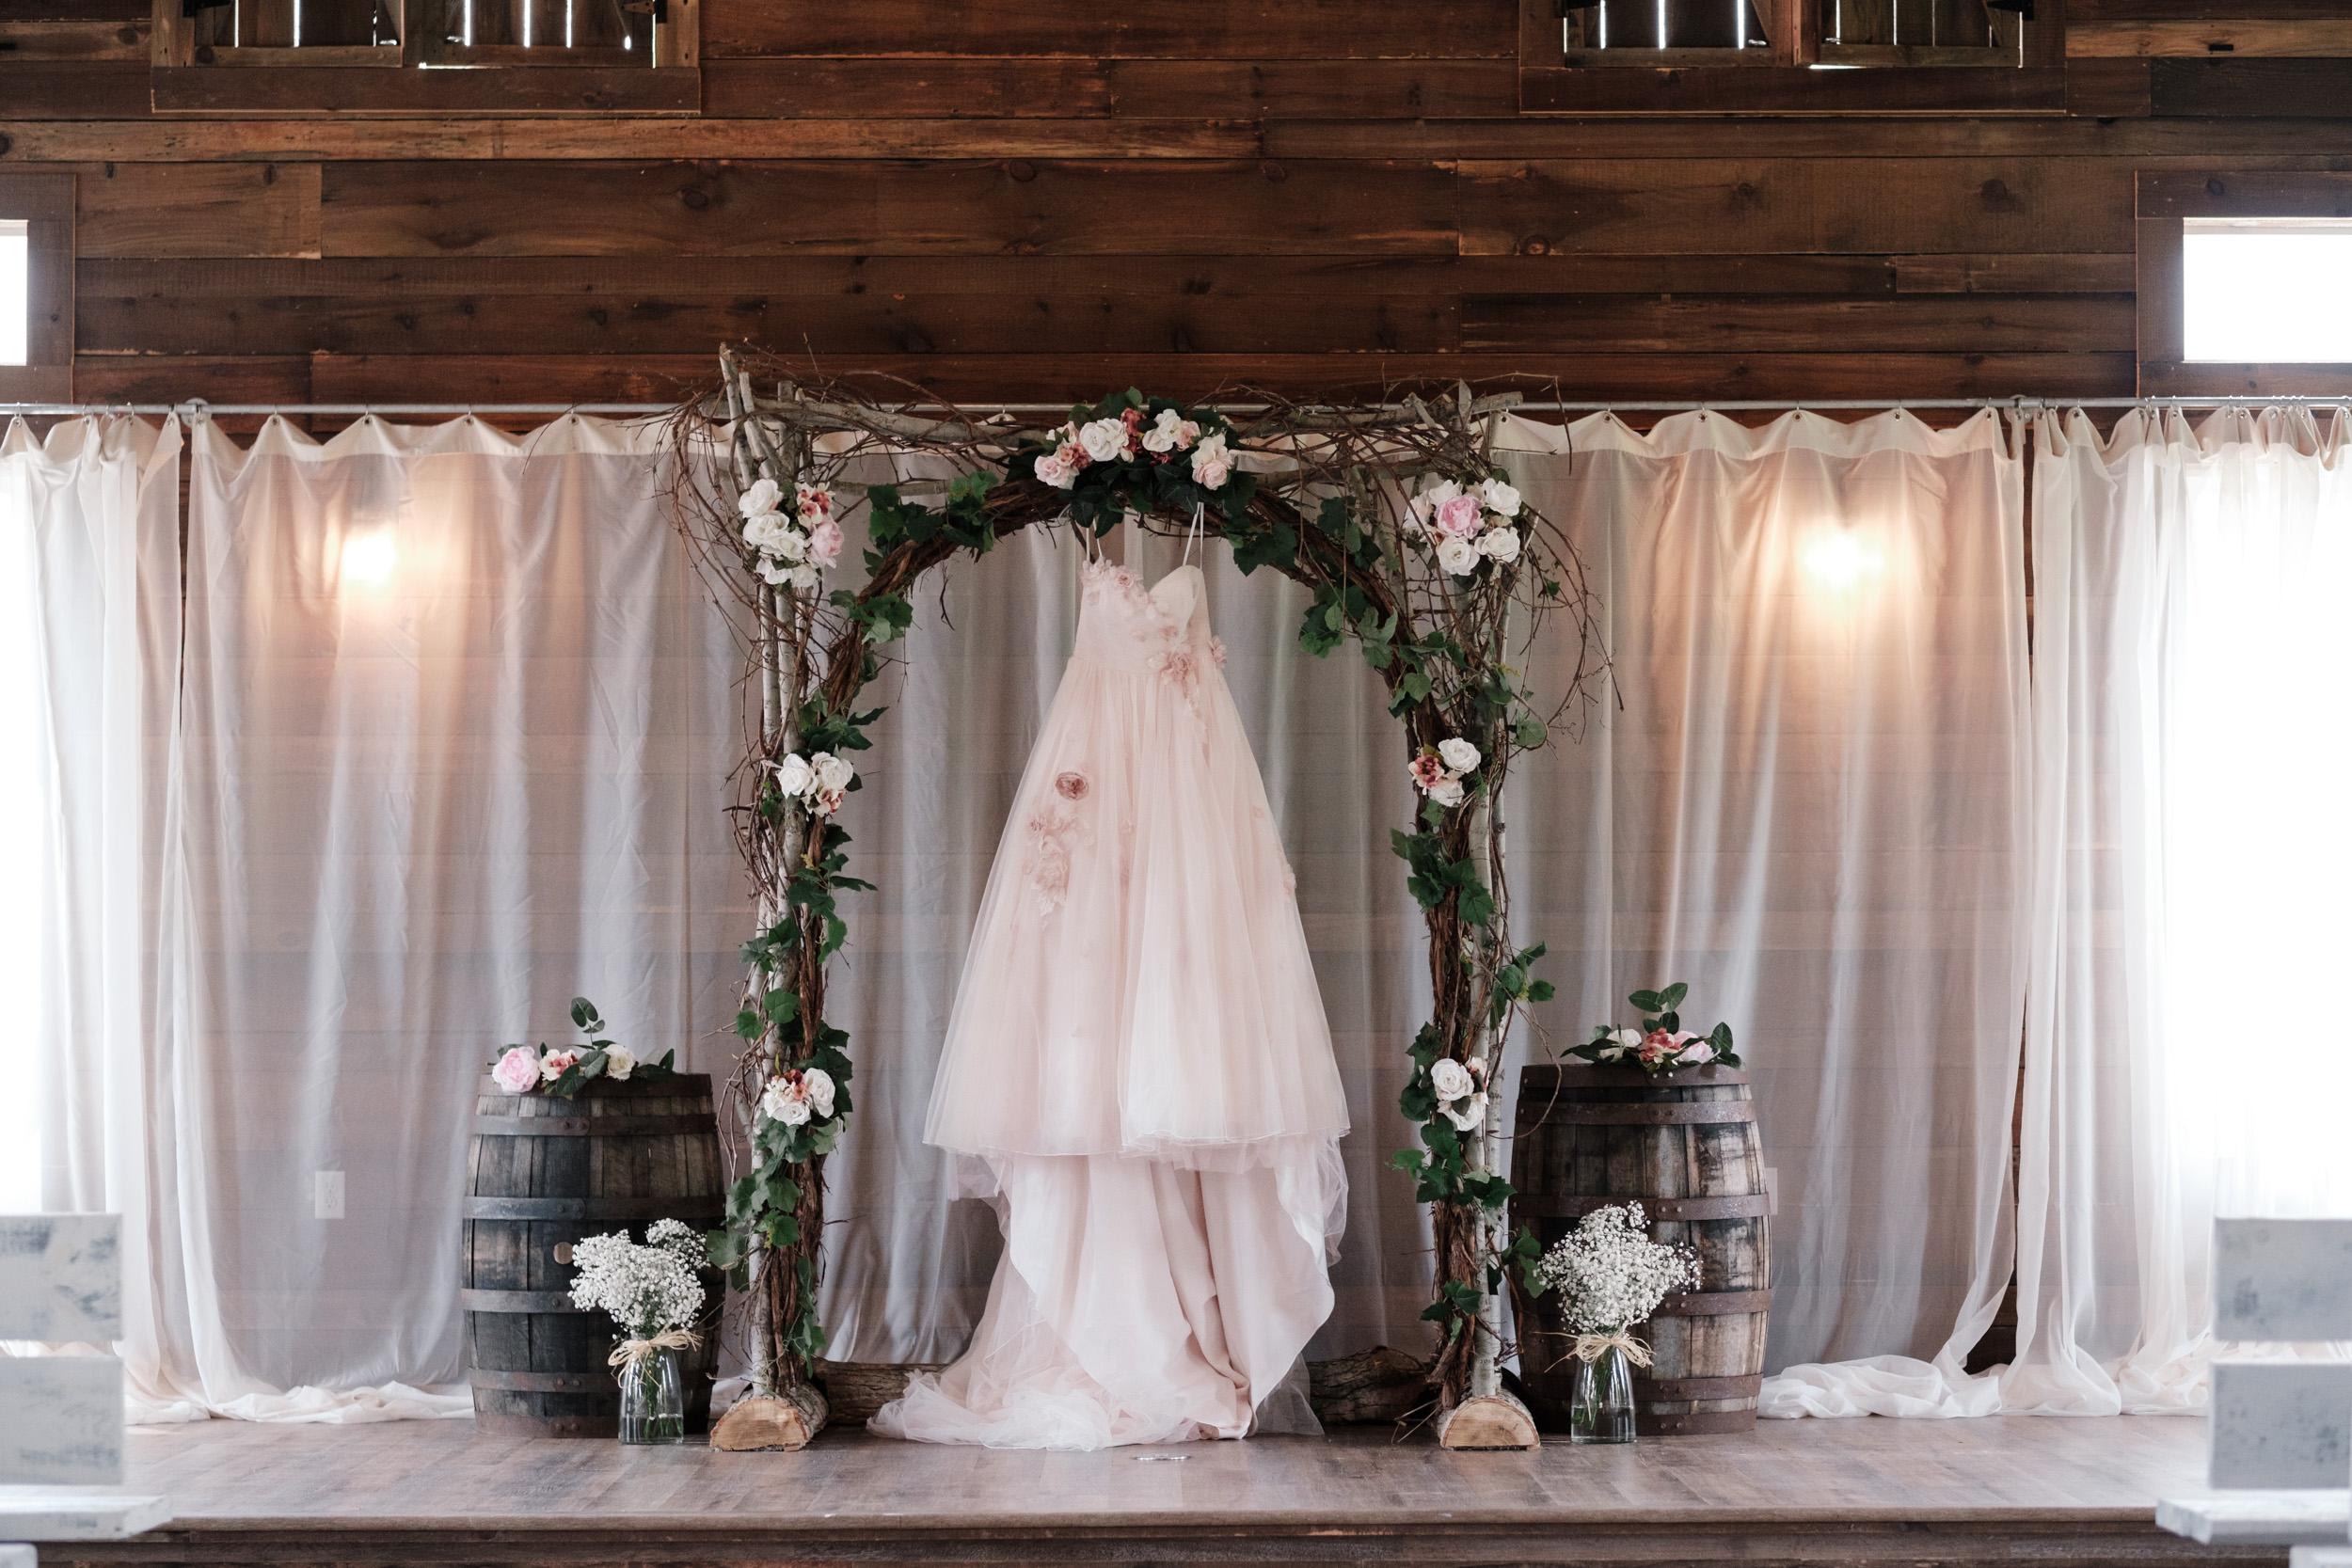 19-06-22-Ryan-Katie-The-Fields-Reserve-Wedding-6.jpg